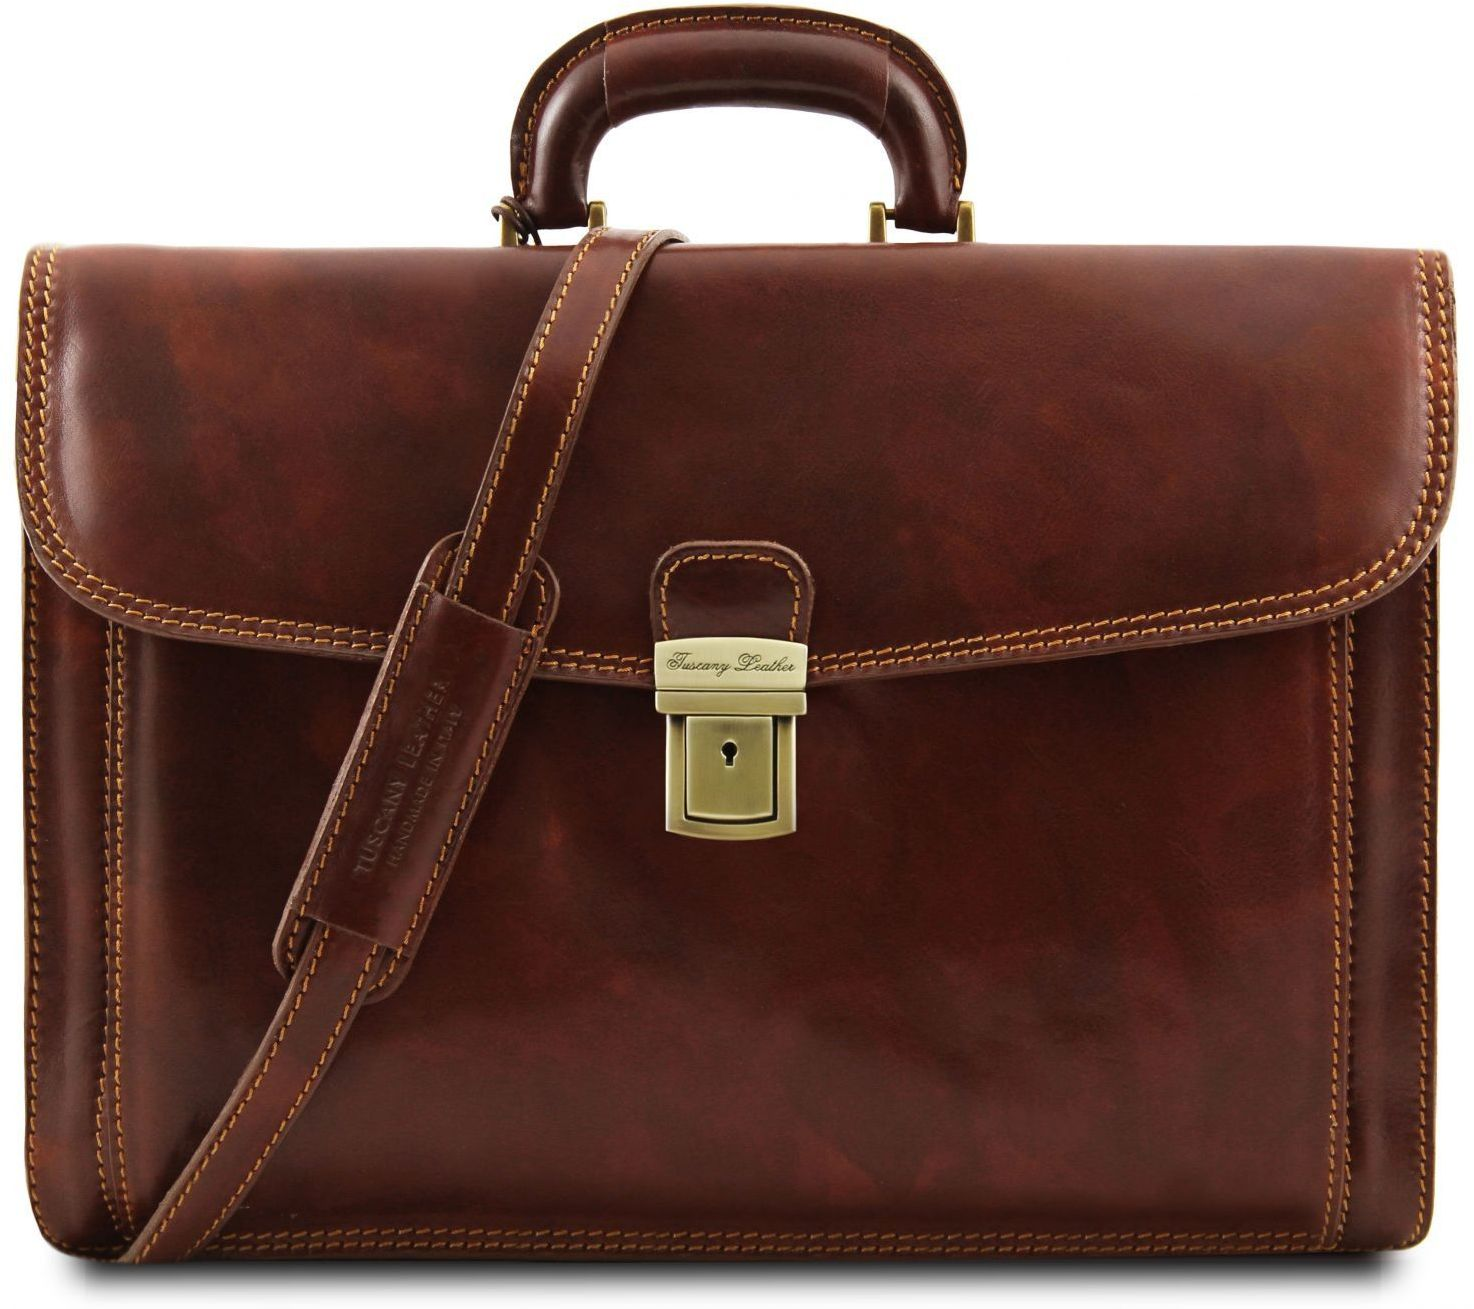 5fd81a66ad Επαγγελματική Τσάντα Δερμάτινη Napoli Καφέ Tuscany Leather